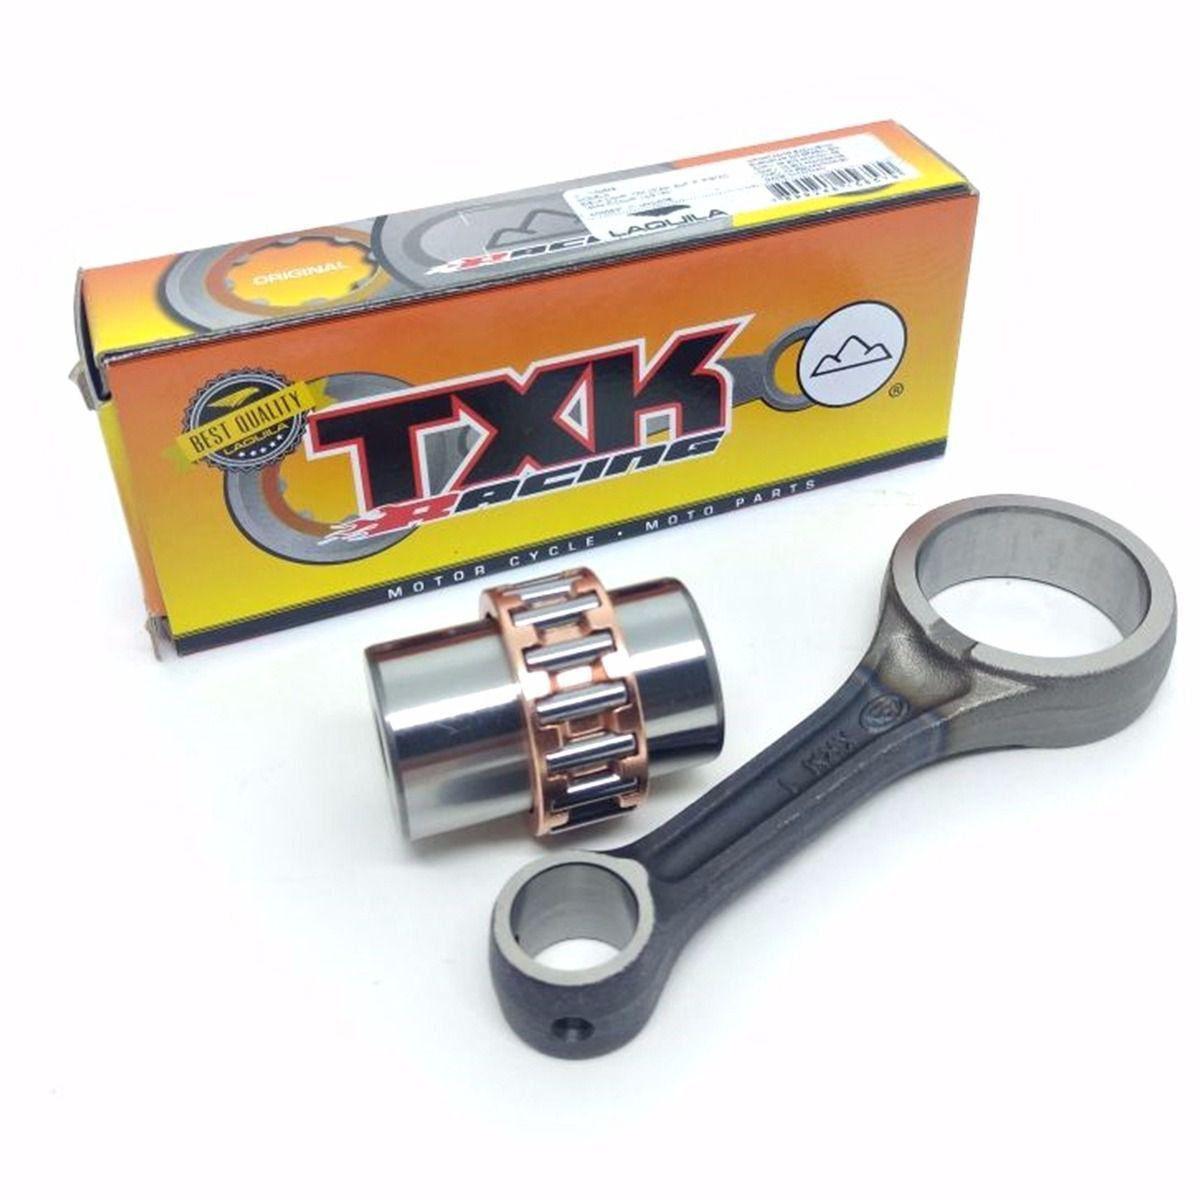 Biela Completa Txk Competição Cg 150 Titan Fan 150 Nxr bros 150 pino 16mm